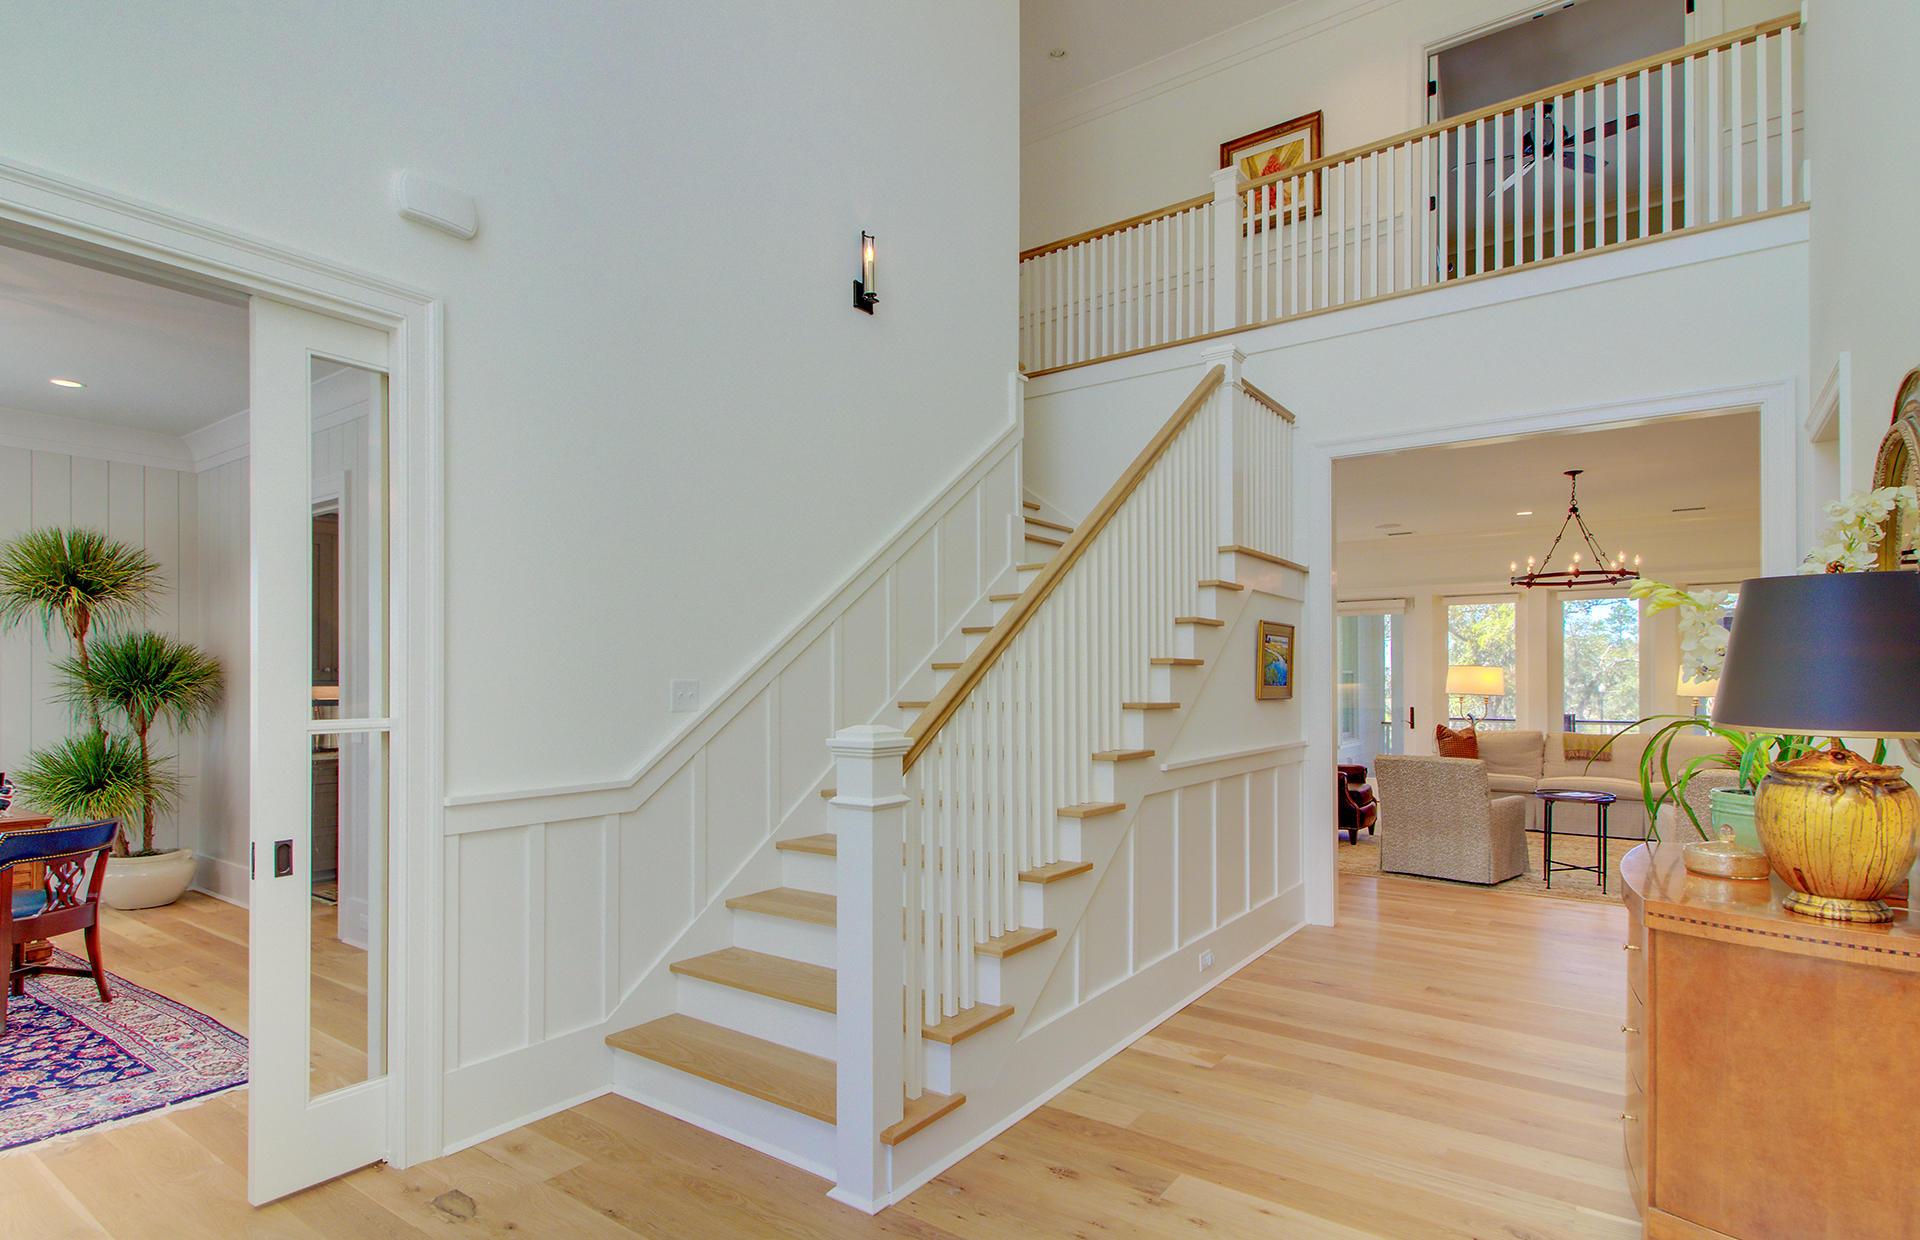 Beresford Hall Homes For Sale - 253 Grand Park, Charleston, SC - 49